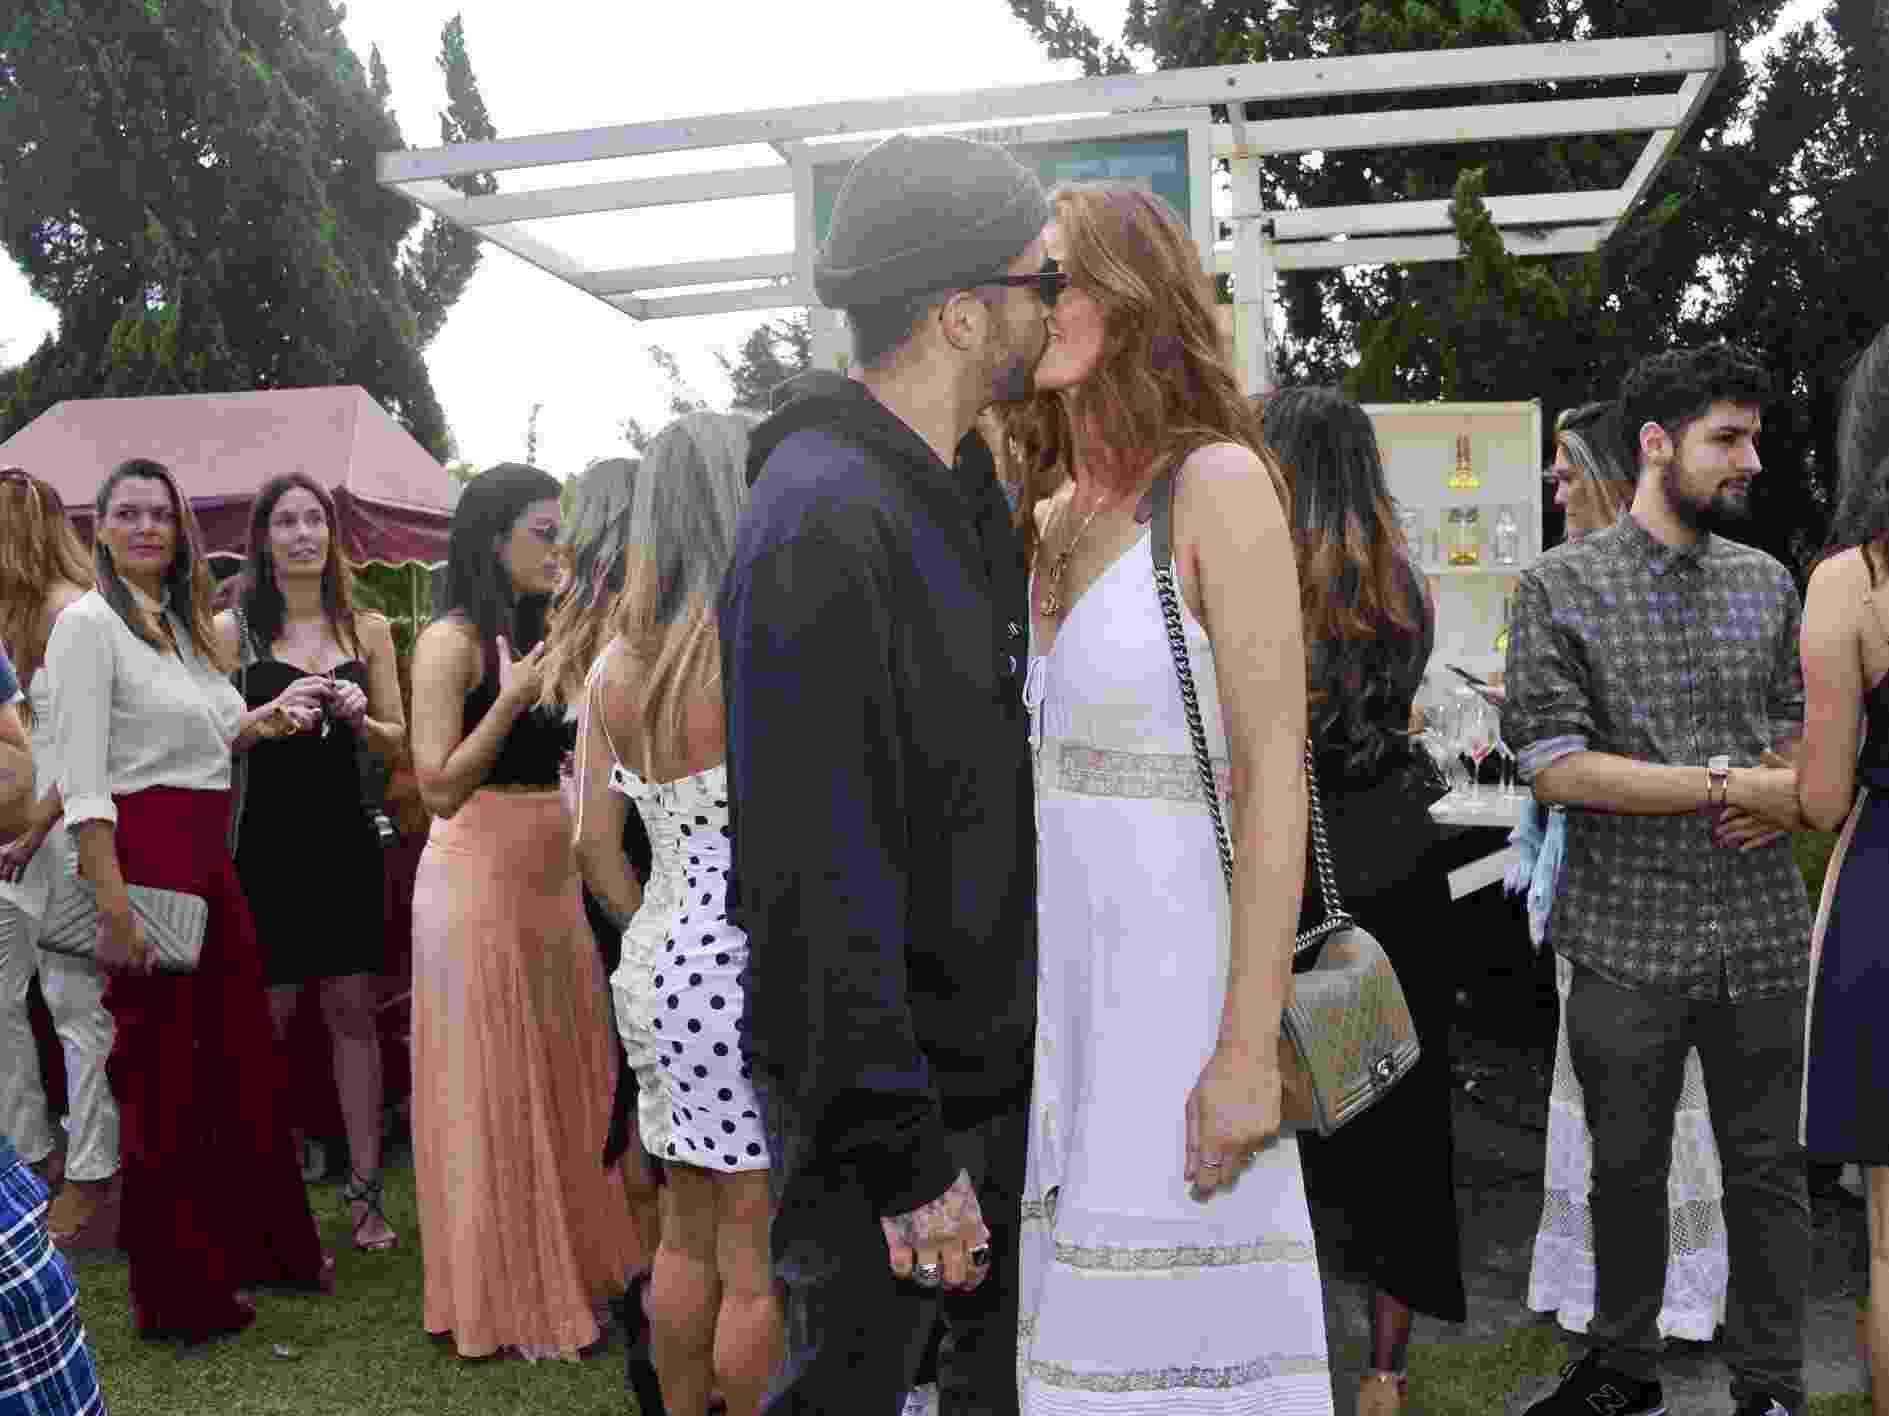 Scooby prestigia a namorada Cintia Dicker em desfile - Samuel Chaves/Brazil News